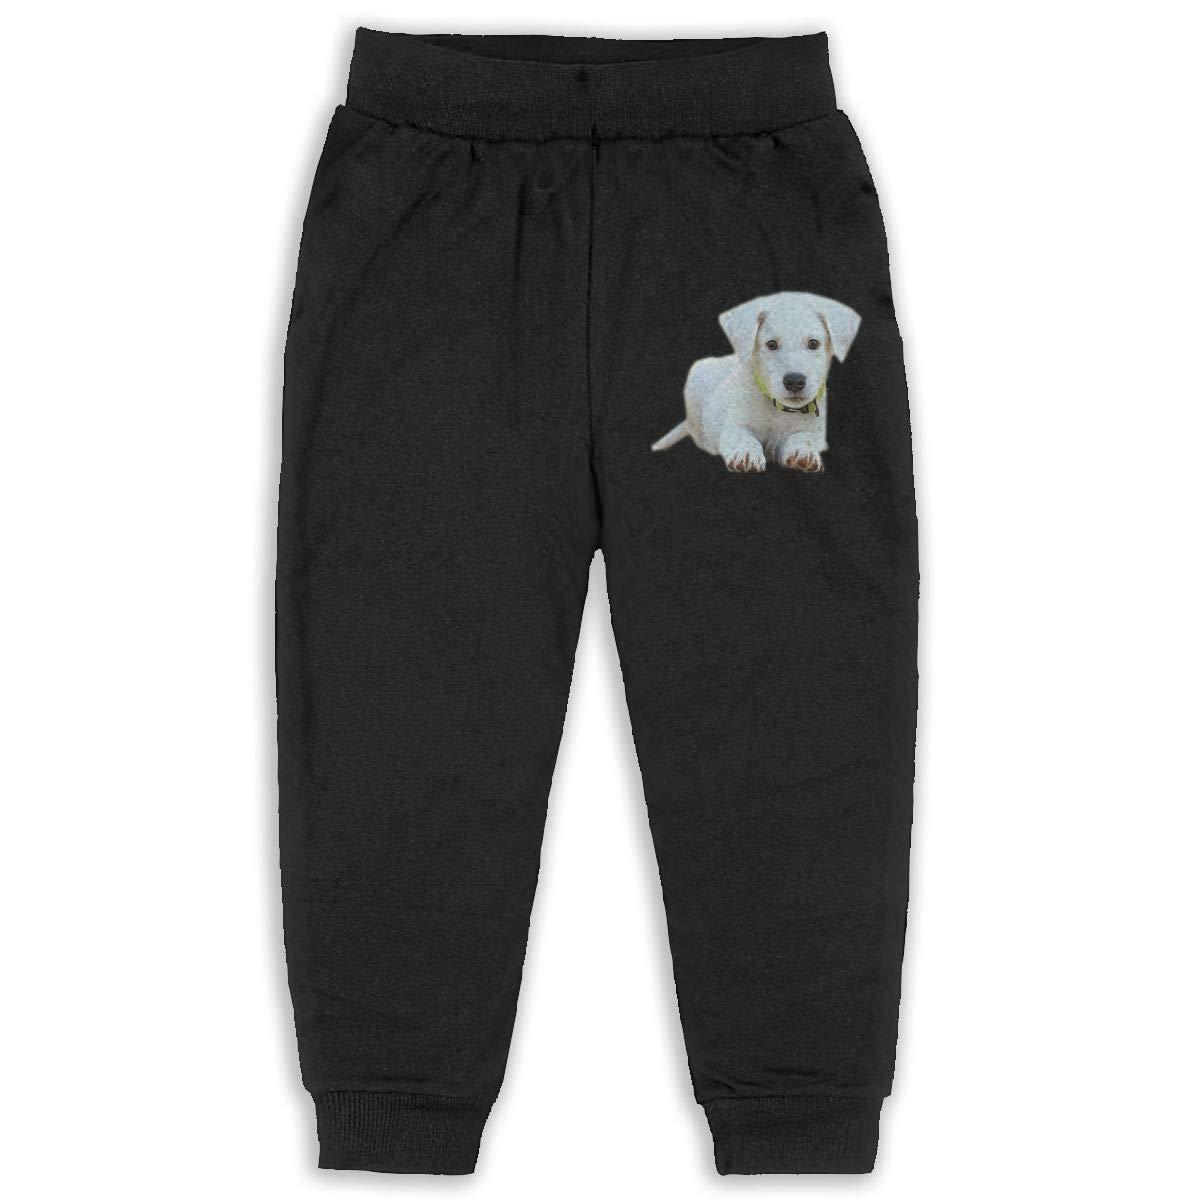 Uyikuvt Sweatpants Puppy Dog Pattern Cotton Toddler Active Jogger Full-Length Regular Size Pants Kids